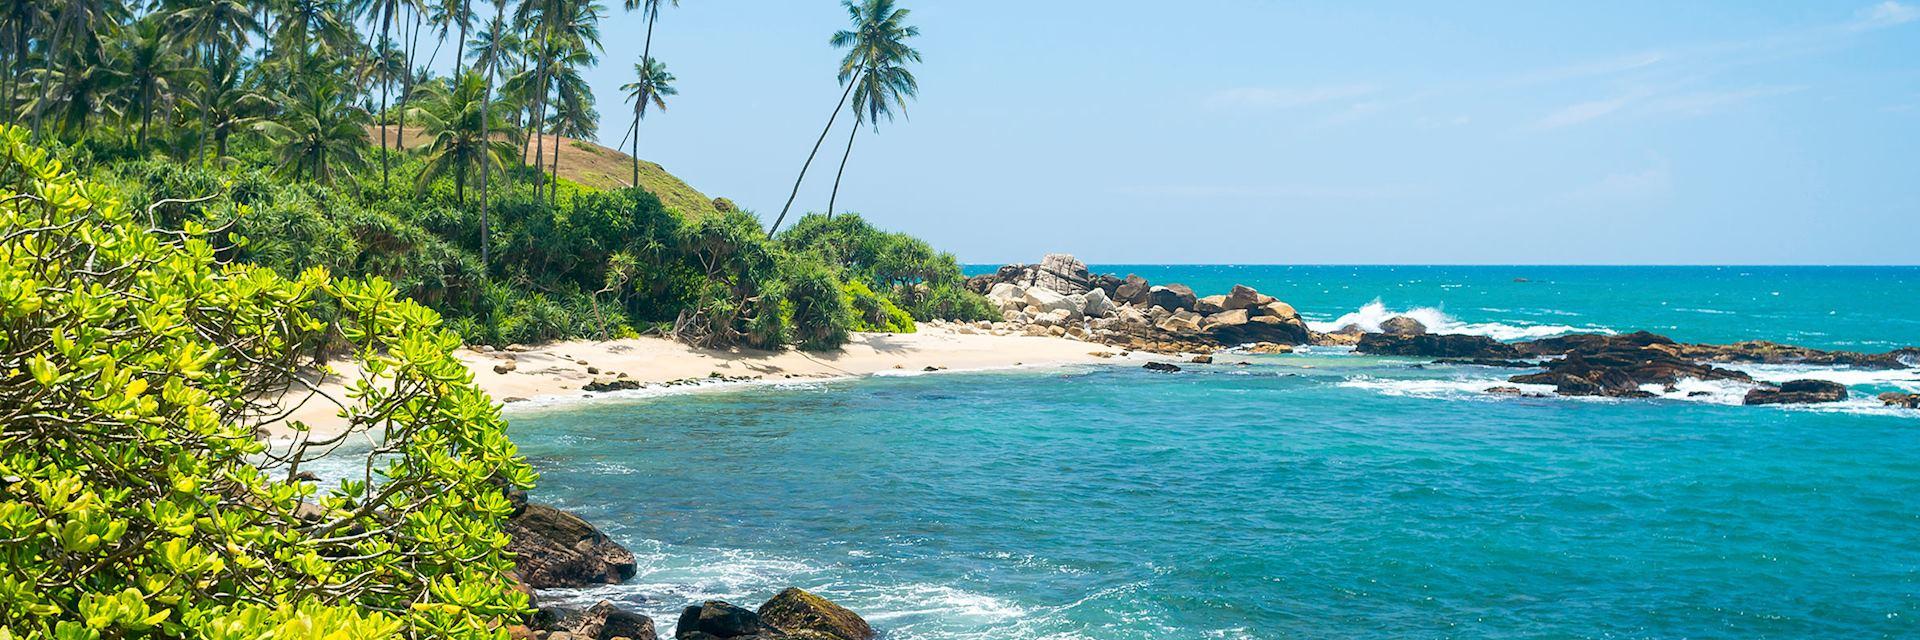 Mirissa coastline in Sri Lanka